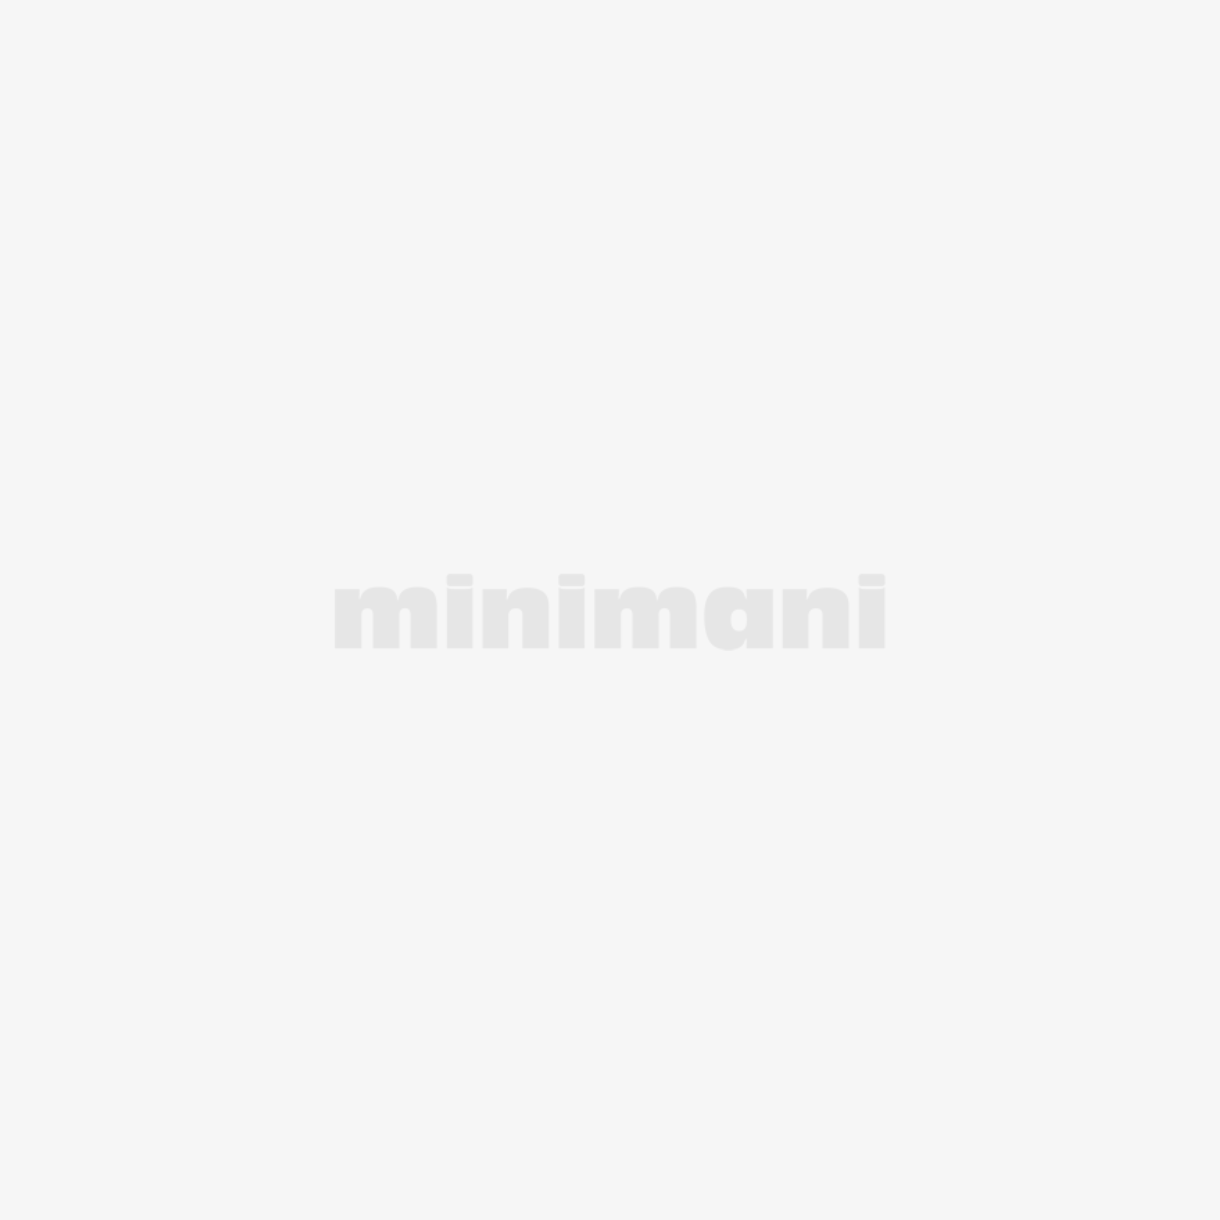 AIRAM VANAMO VÄLITILAVALAISIN 114 14W G5 3000K